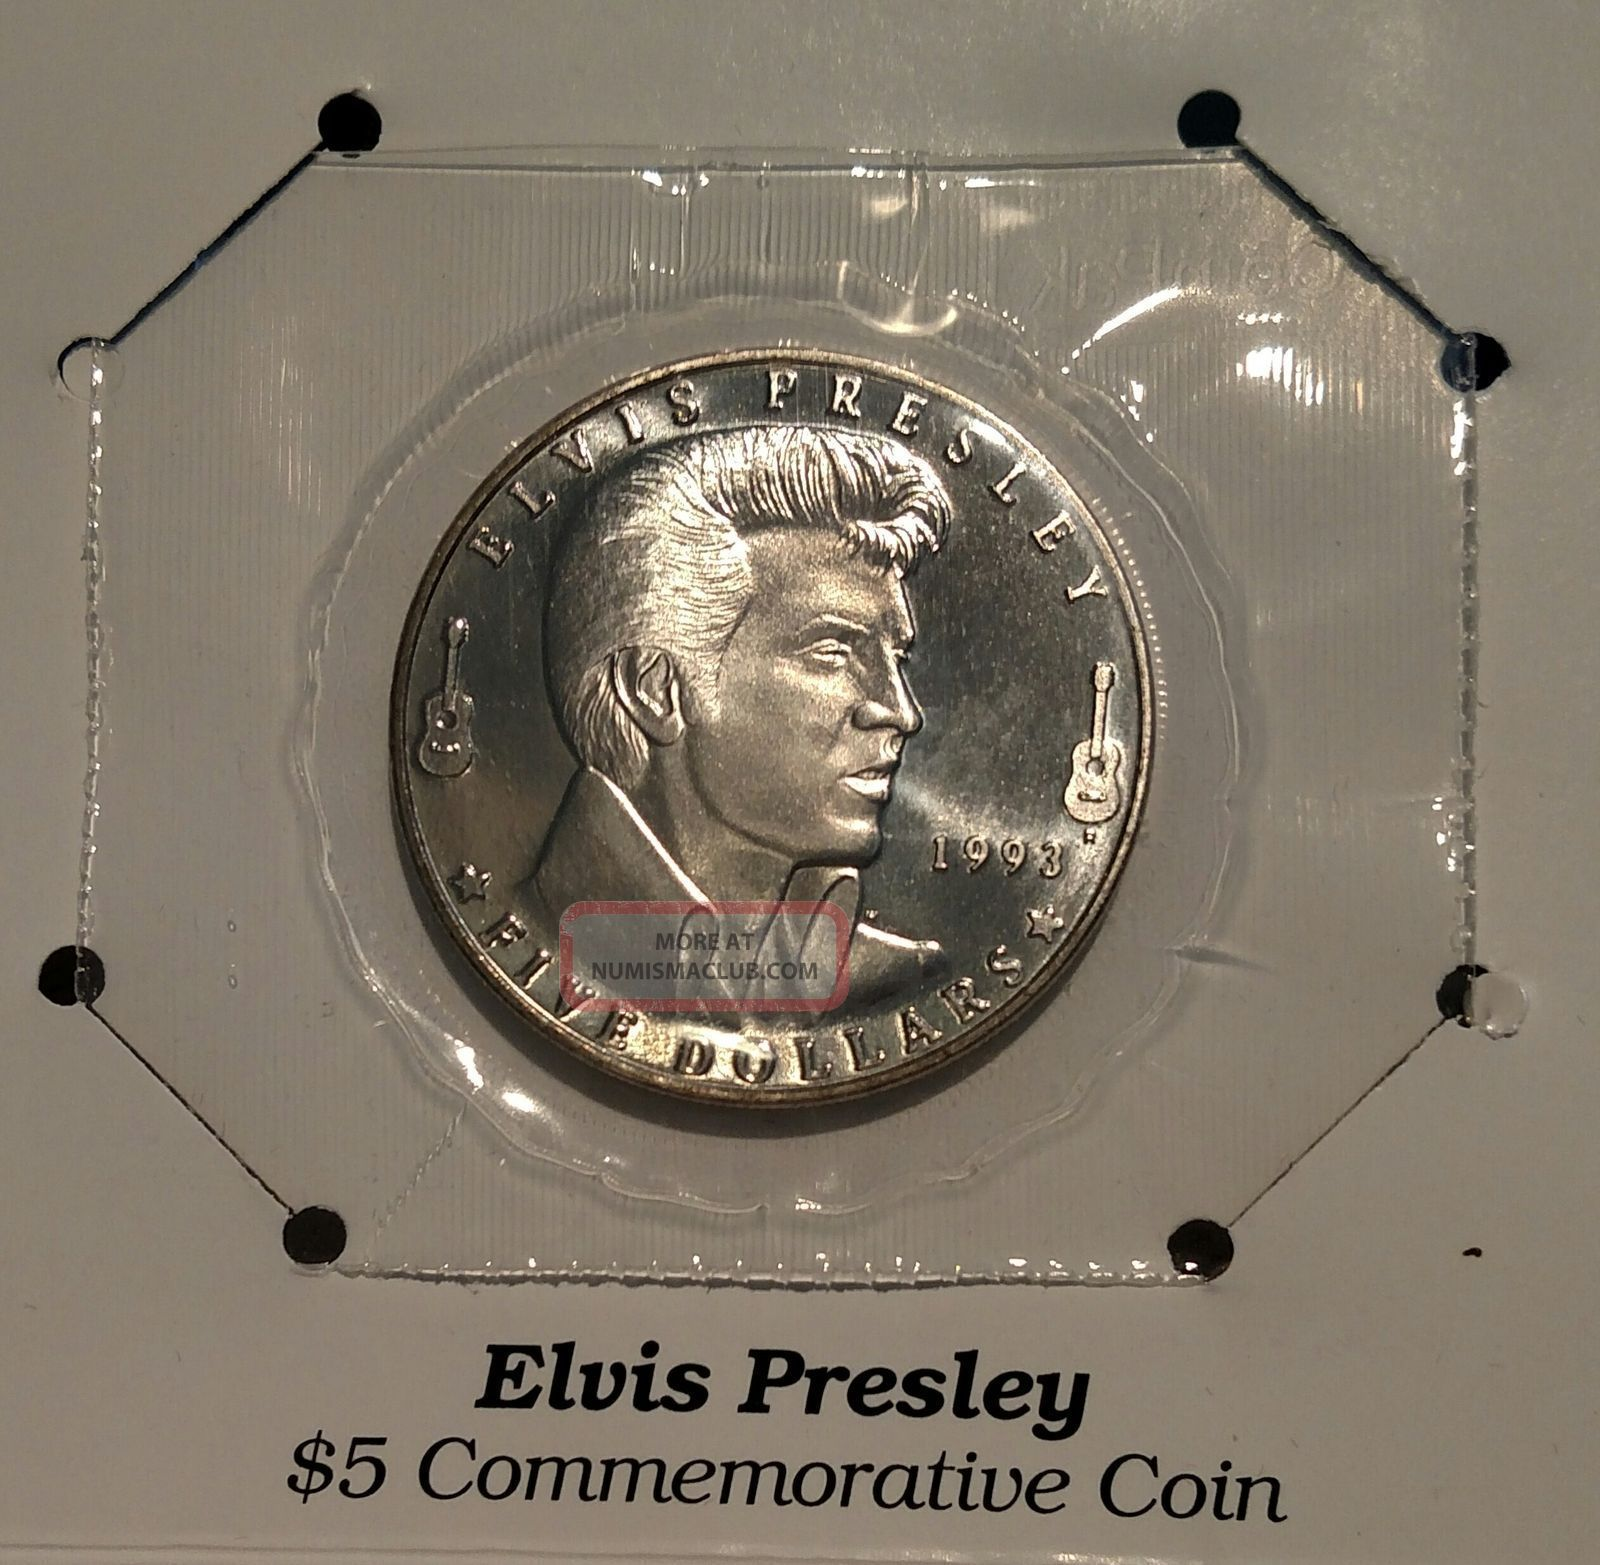 Elvis Presley 1993 $5 Commemorative Coin Coins: World photo